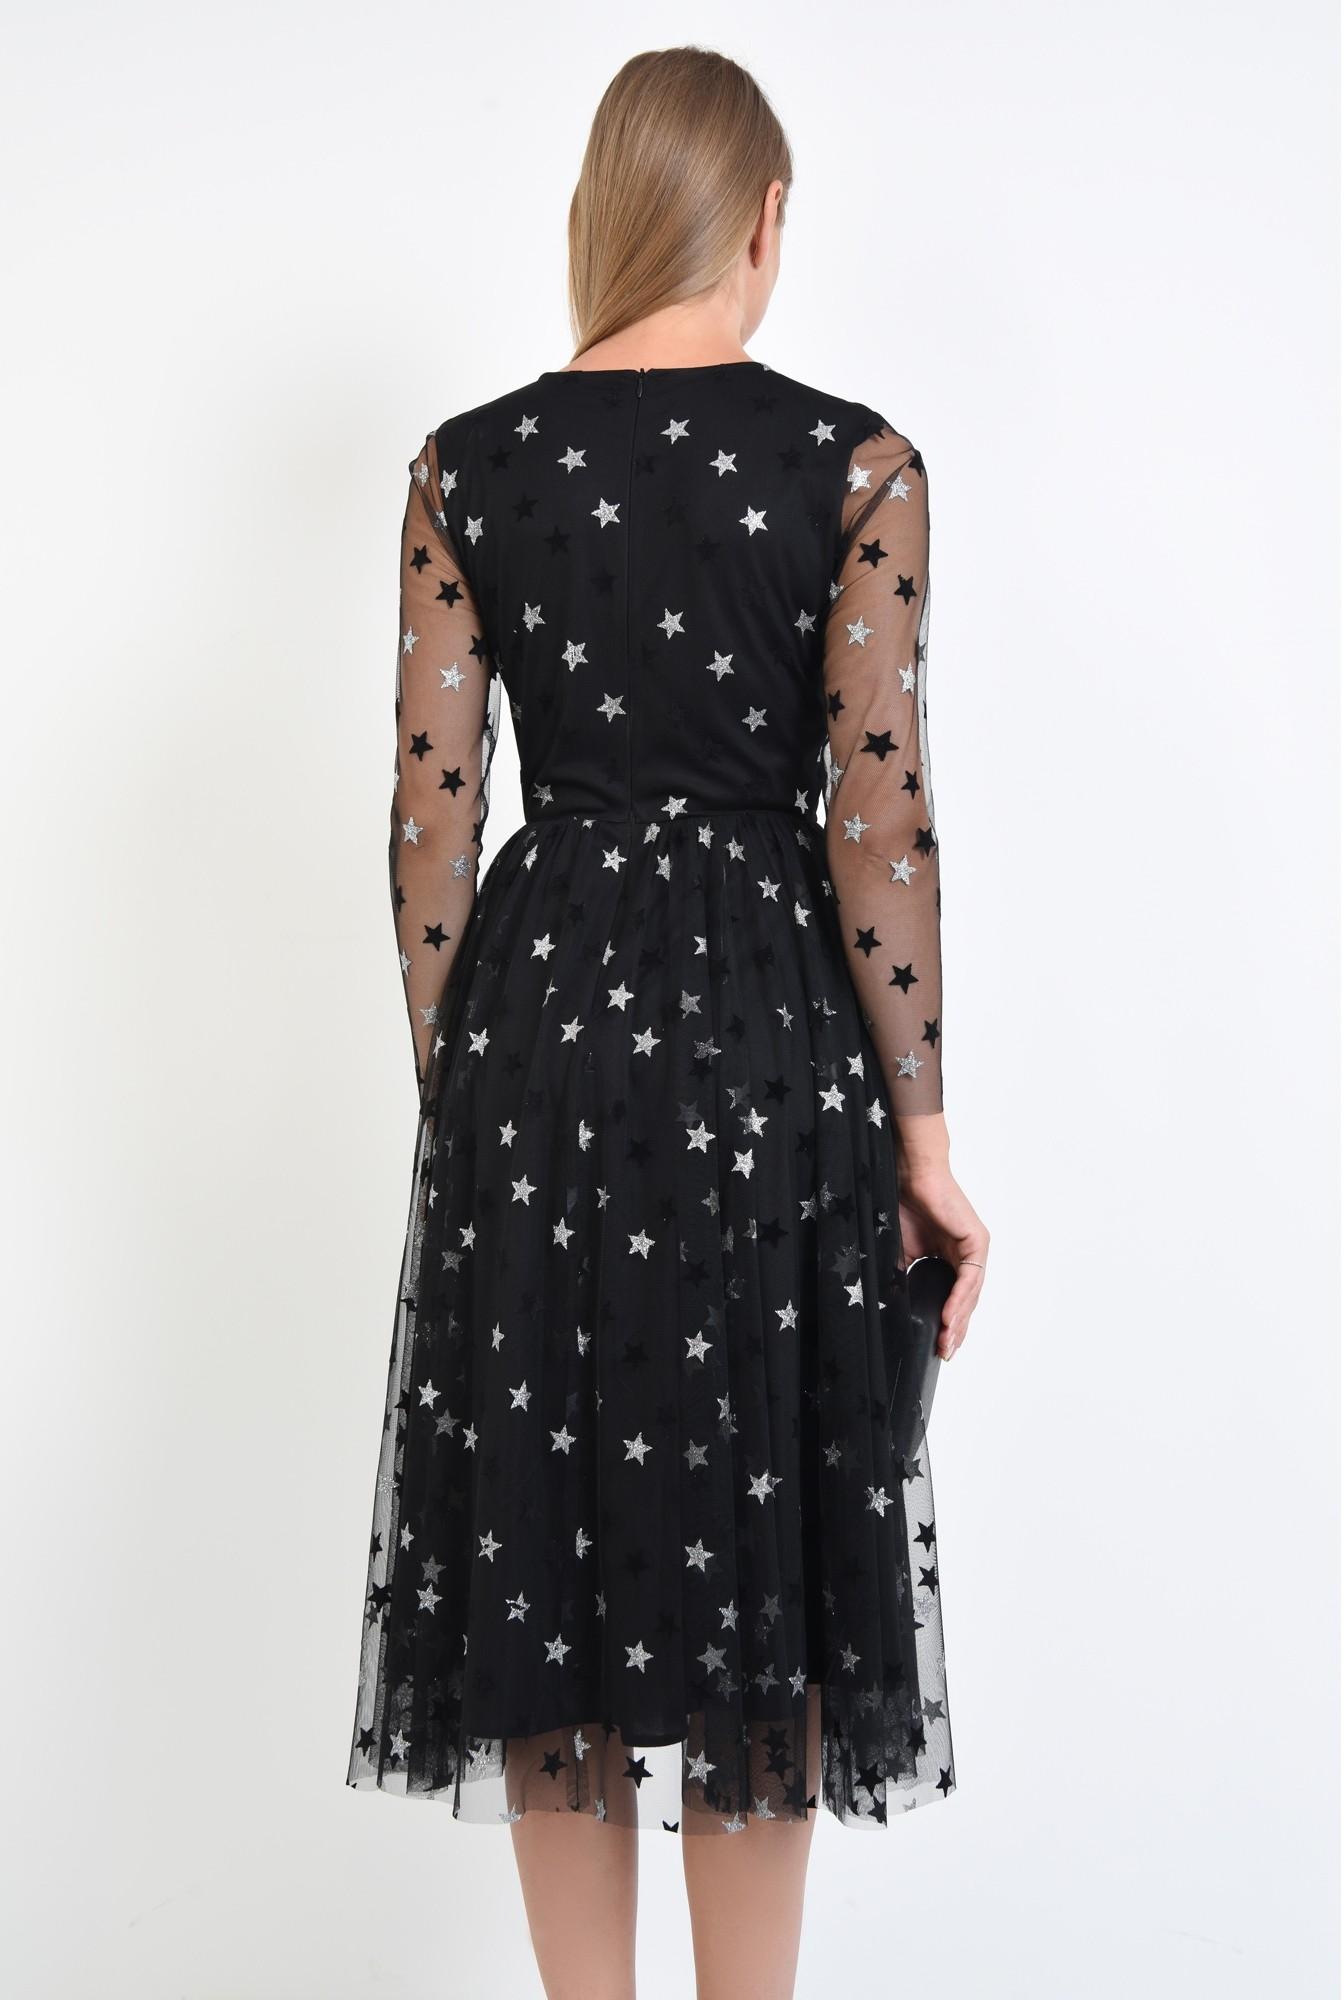 1 - 360 - rochie neagra, croi evazat, cusatura in talie, maneci lungi